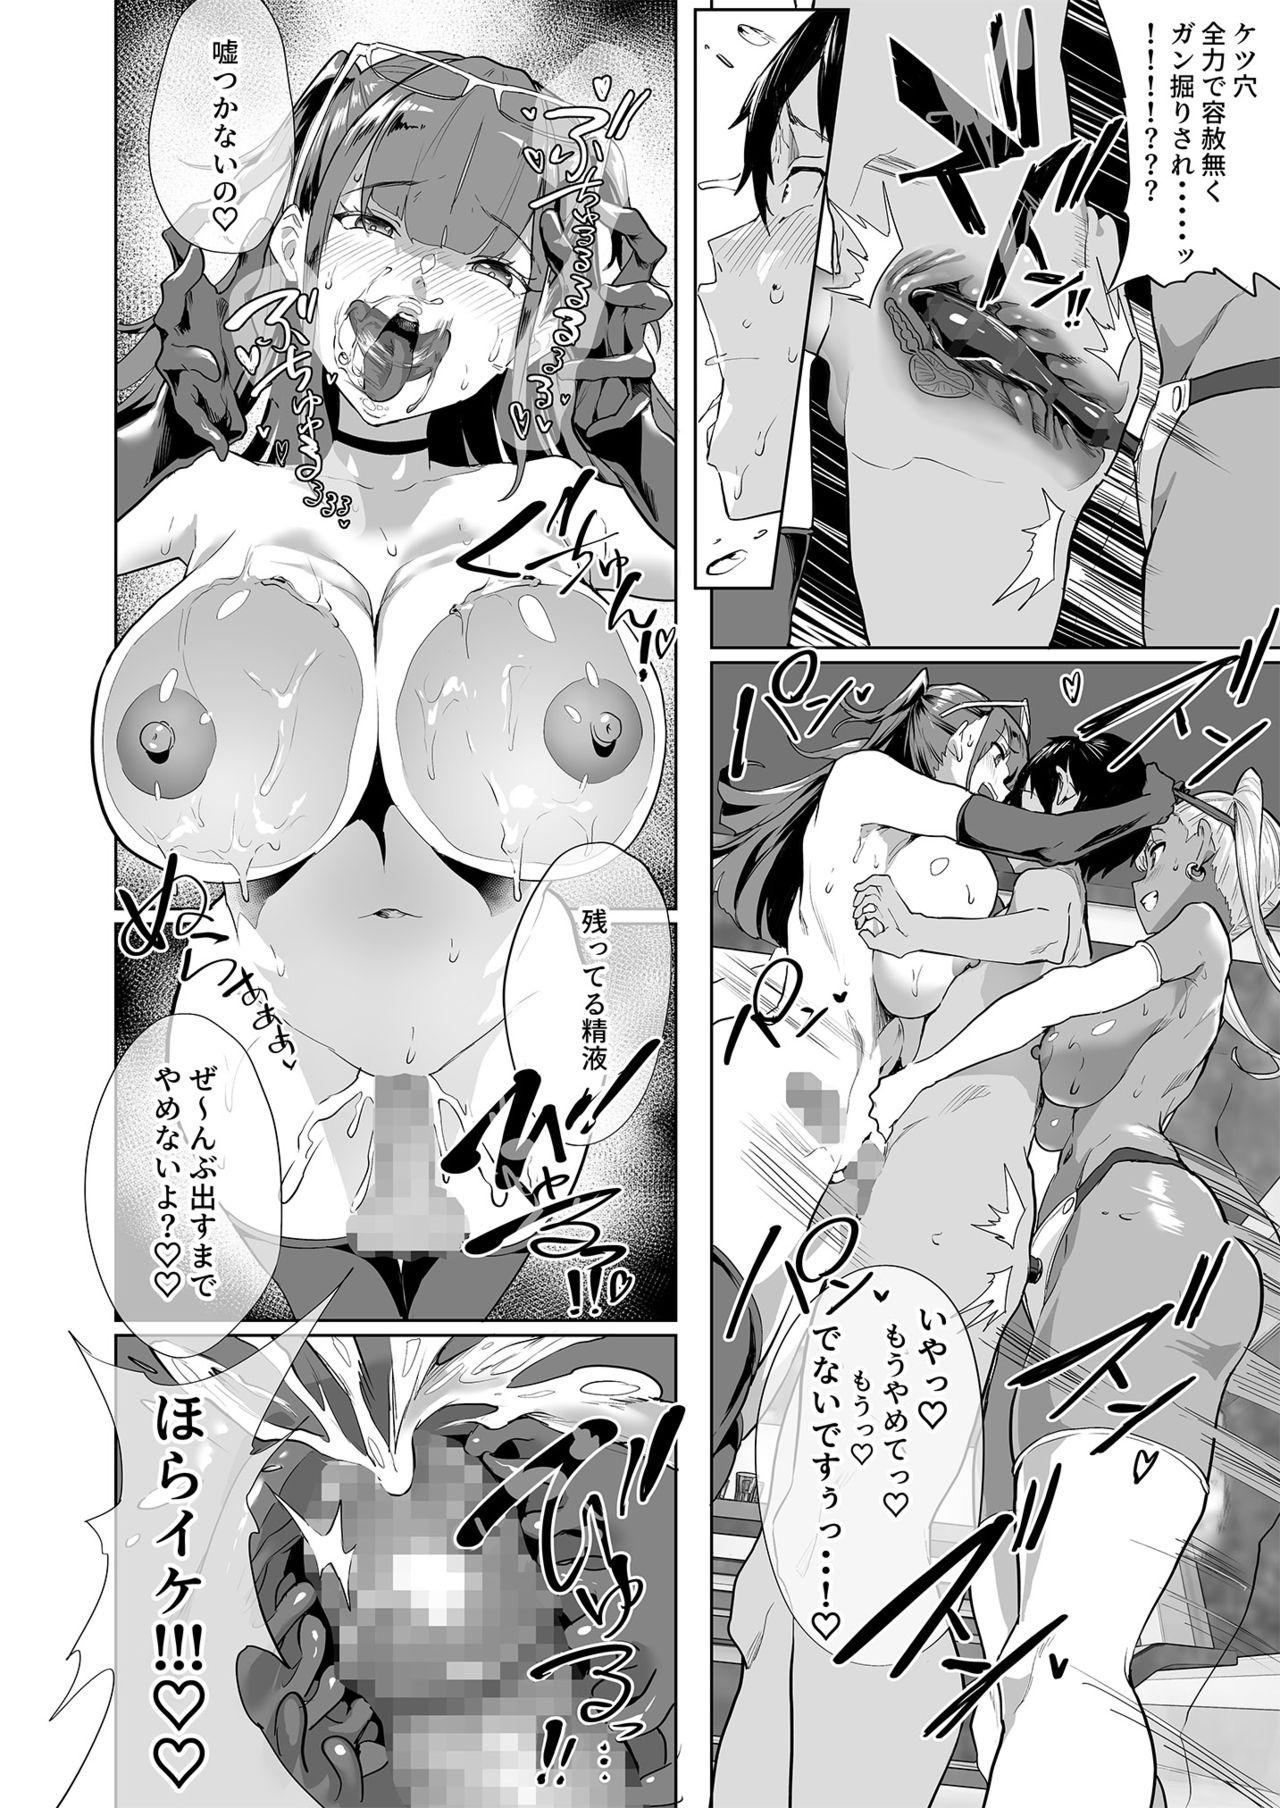 Harem de NEWGAME+!! vol.2 ~VR Eroge de Ittara Mirai wa Harem Sekai ni Natte Ita!? - New Game With My Harem!! 30